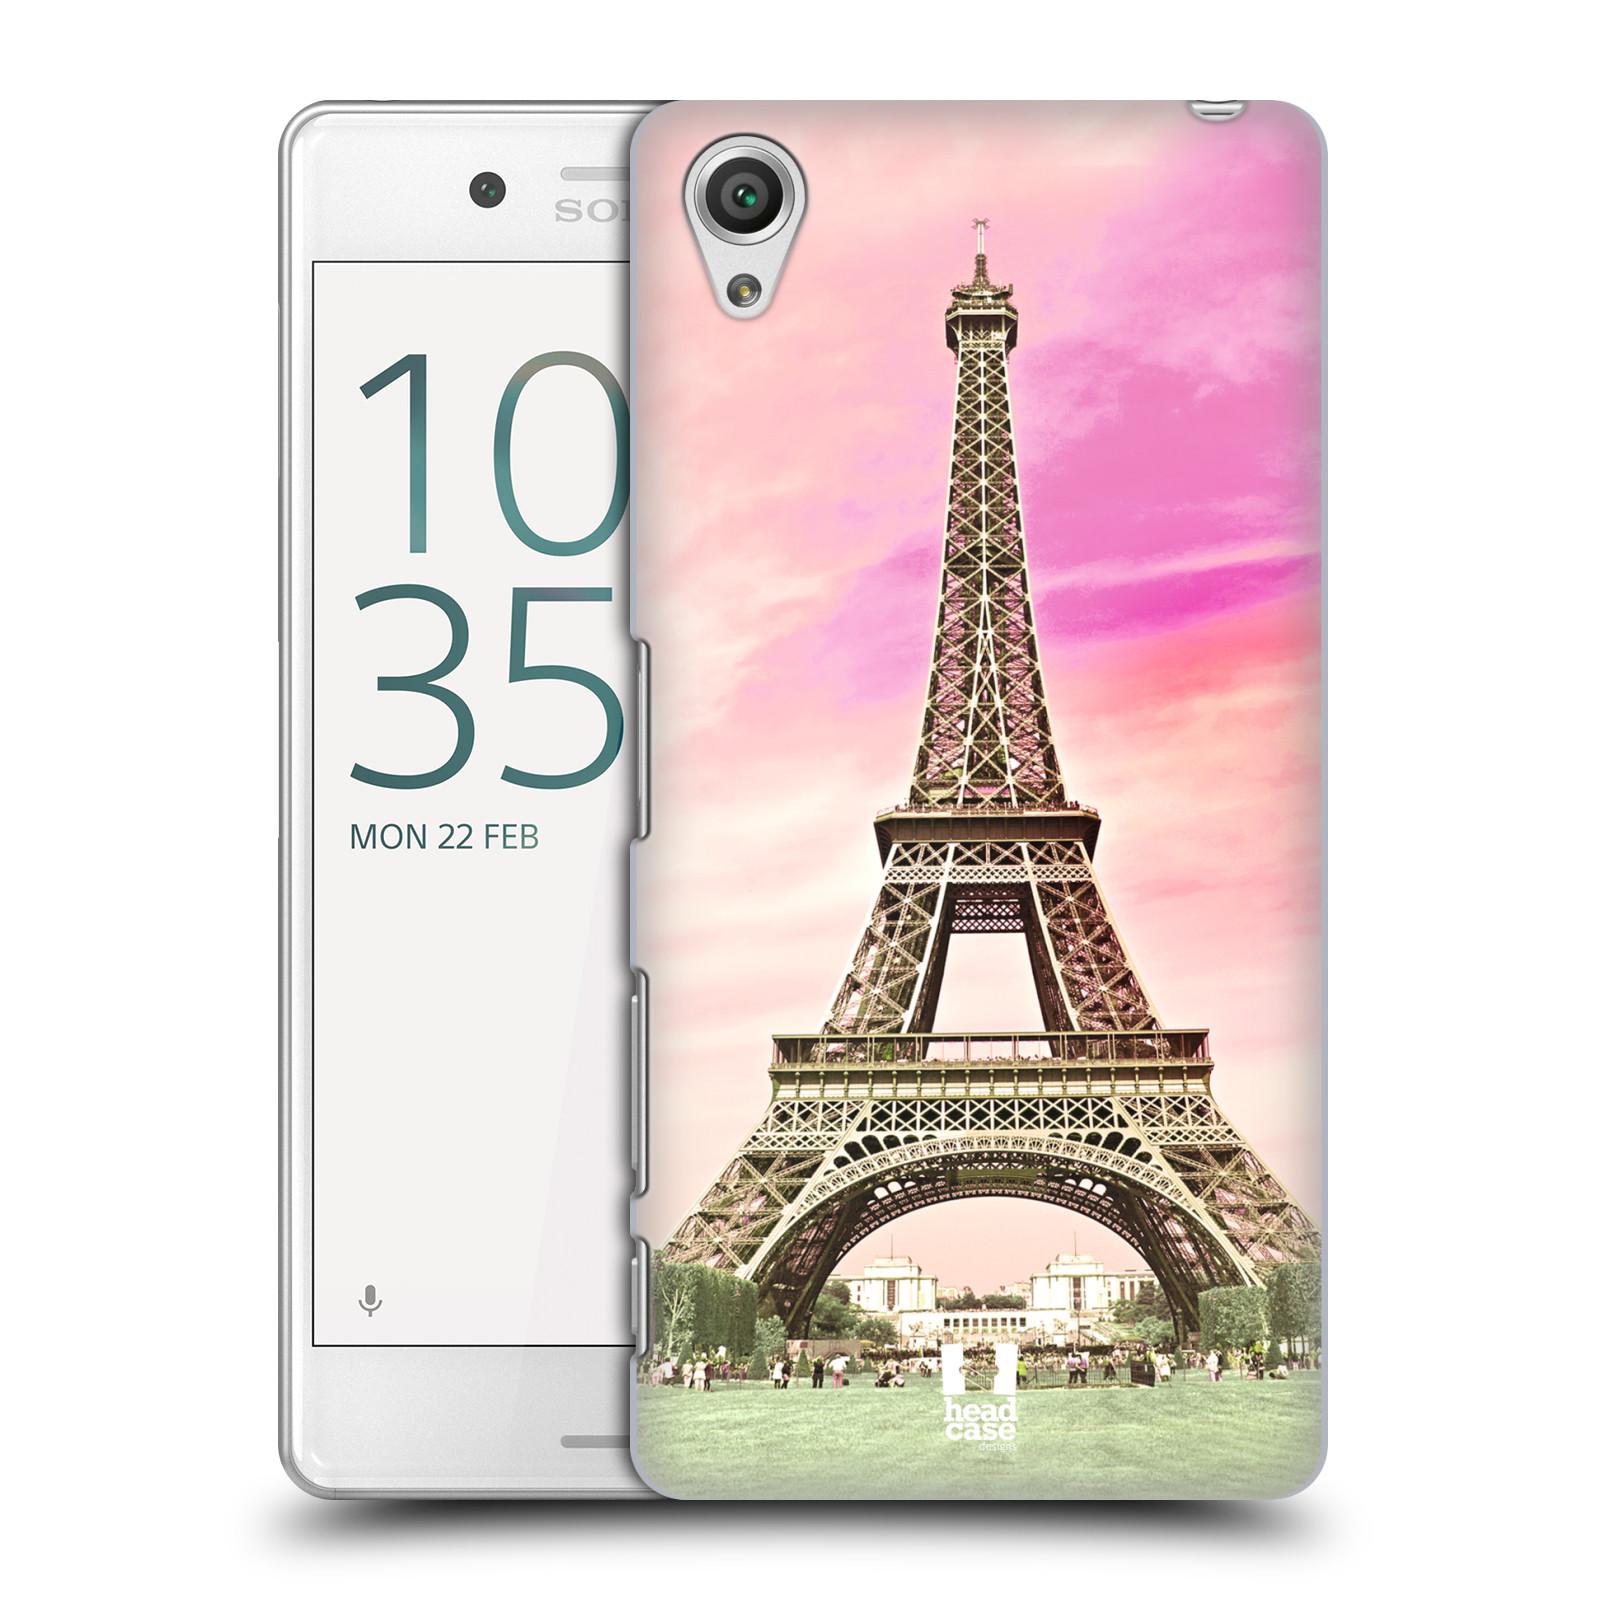 Pouzdro na mobil Sony Xperia X PERFORMANCE - HEAD CASE - historická místa Eiffelova věž Paříž